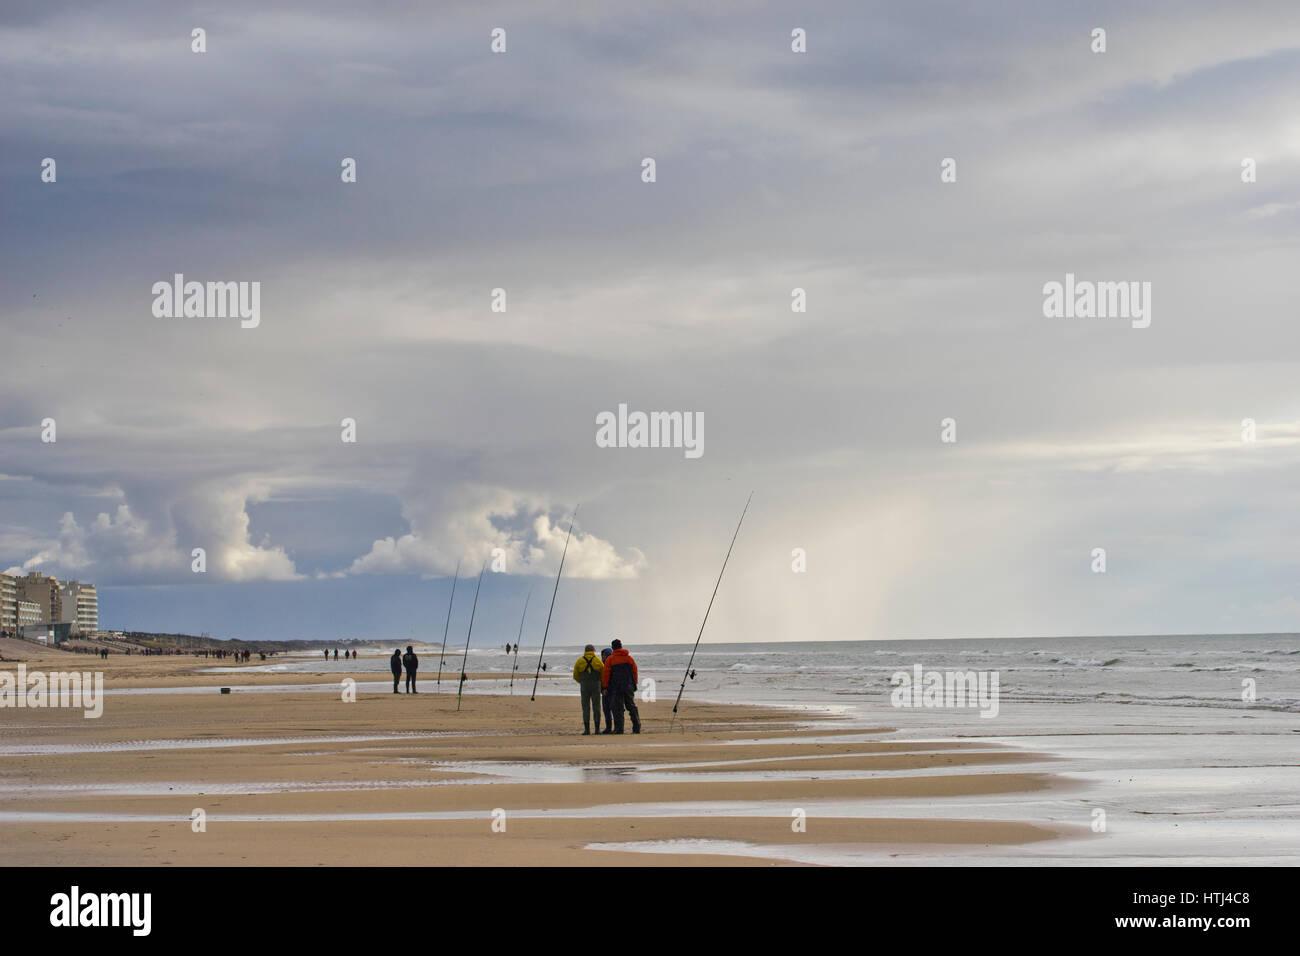 fishermen at  Hardelot beach, France, Nord Pas de Calais - Stock Image